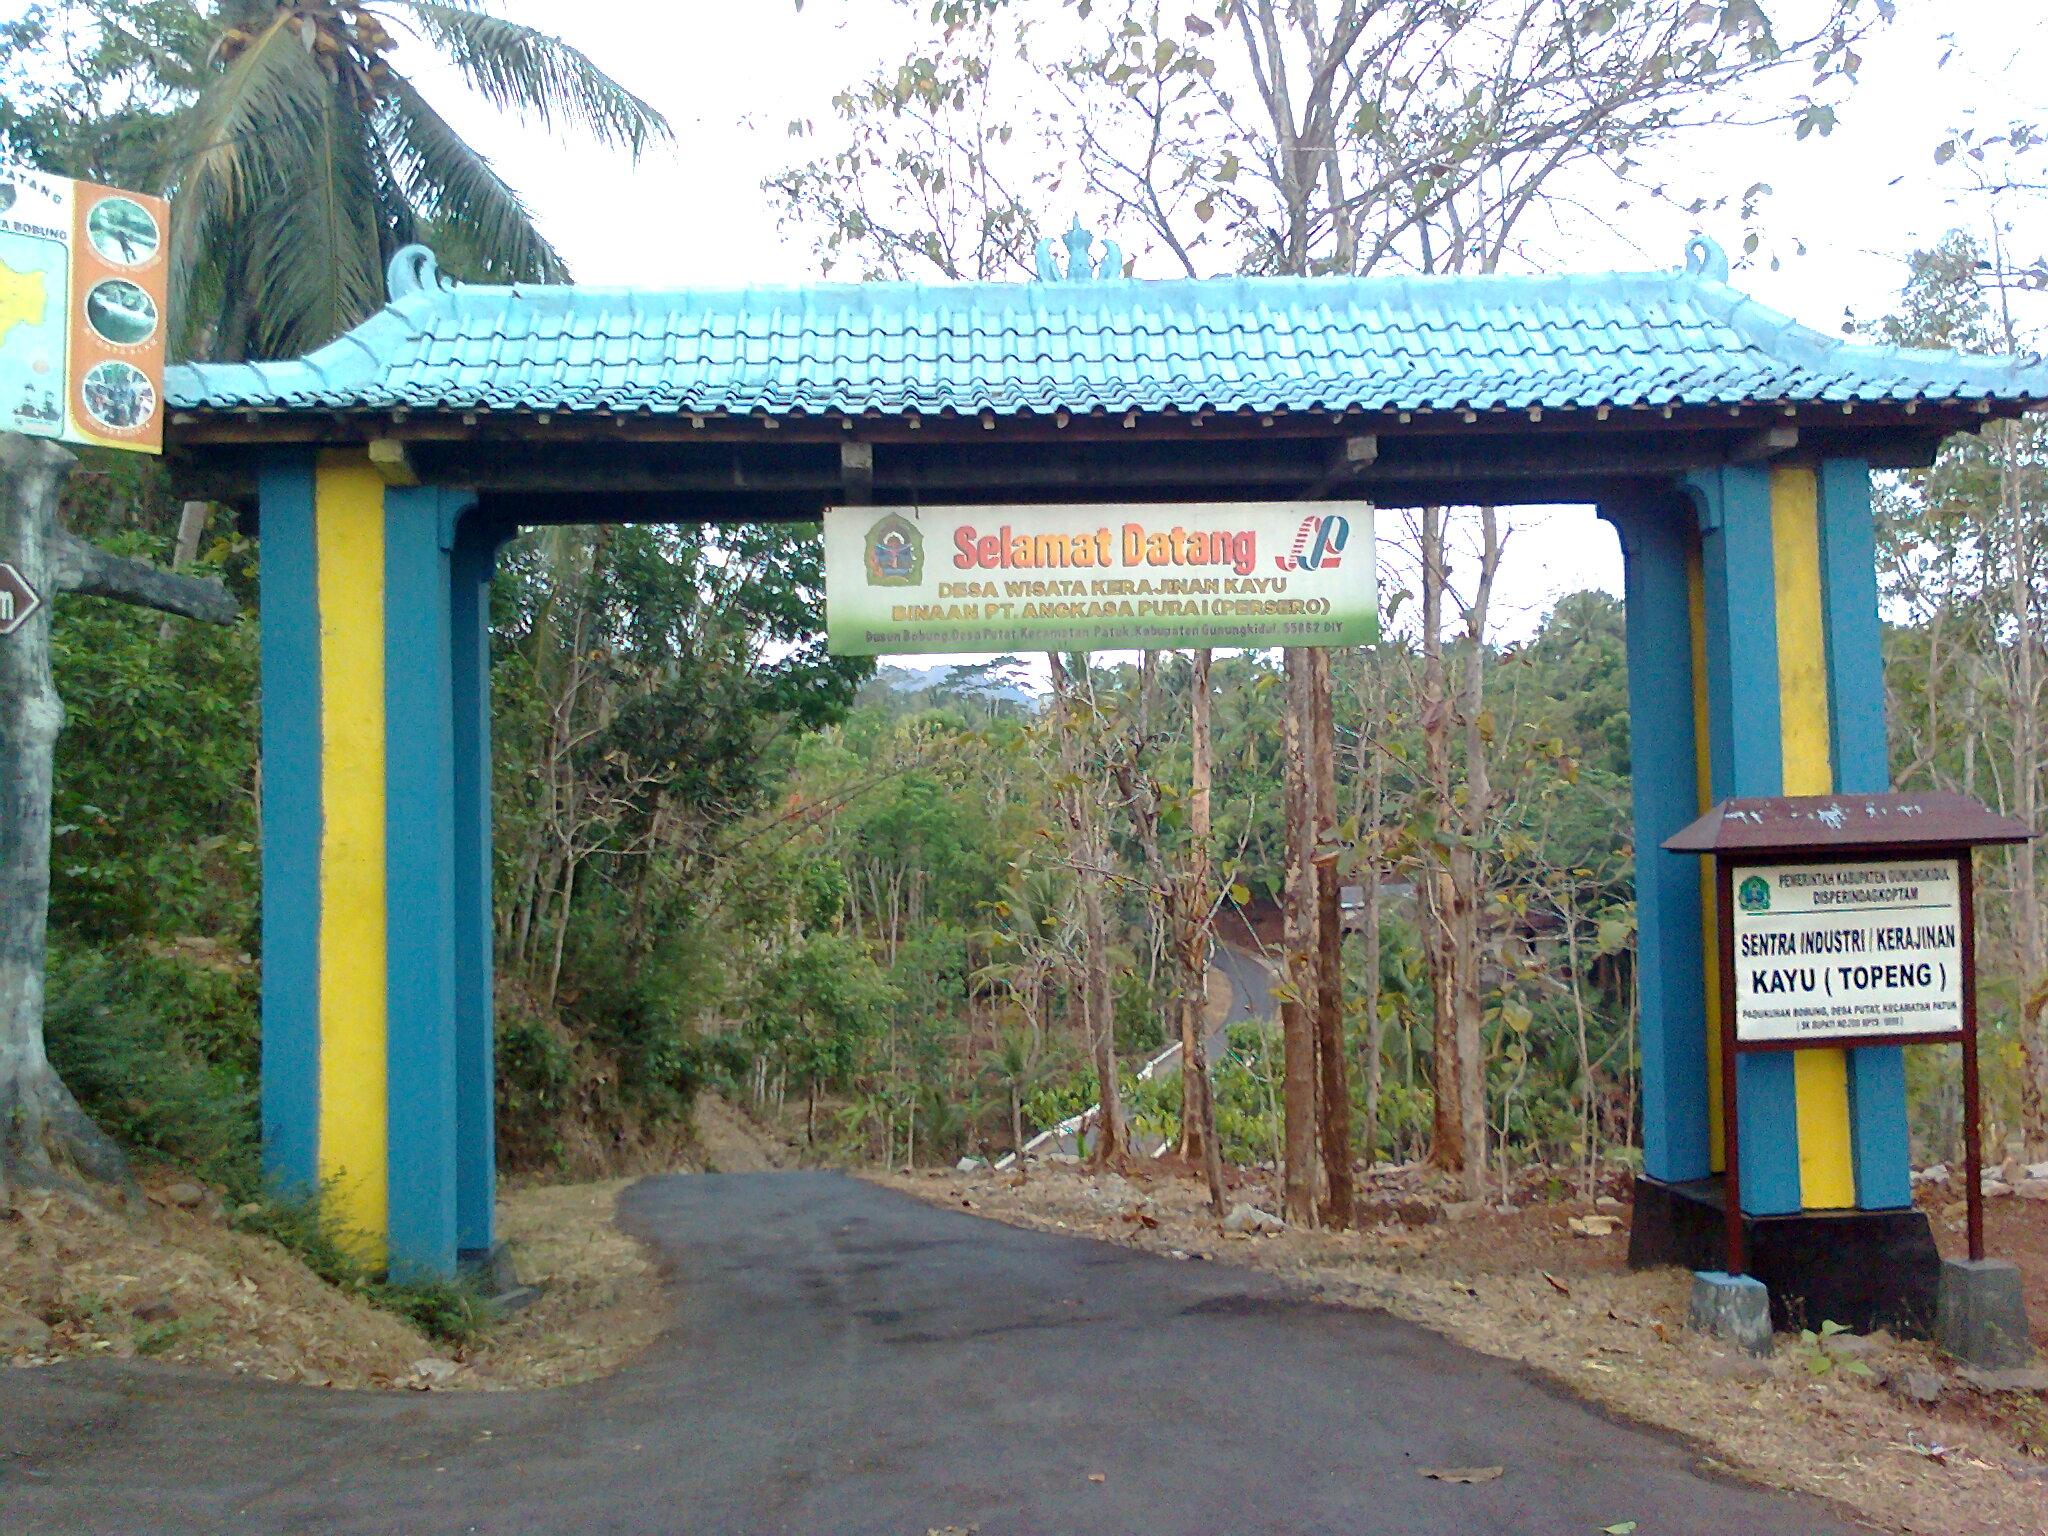 Desa Wisata Pucung Patung Primitif Yogyakarta Belajar Berkreasi Seni Batik